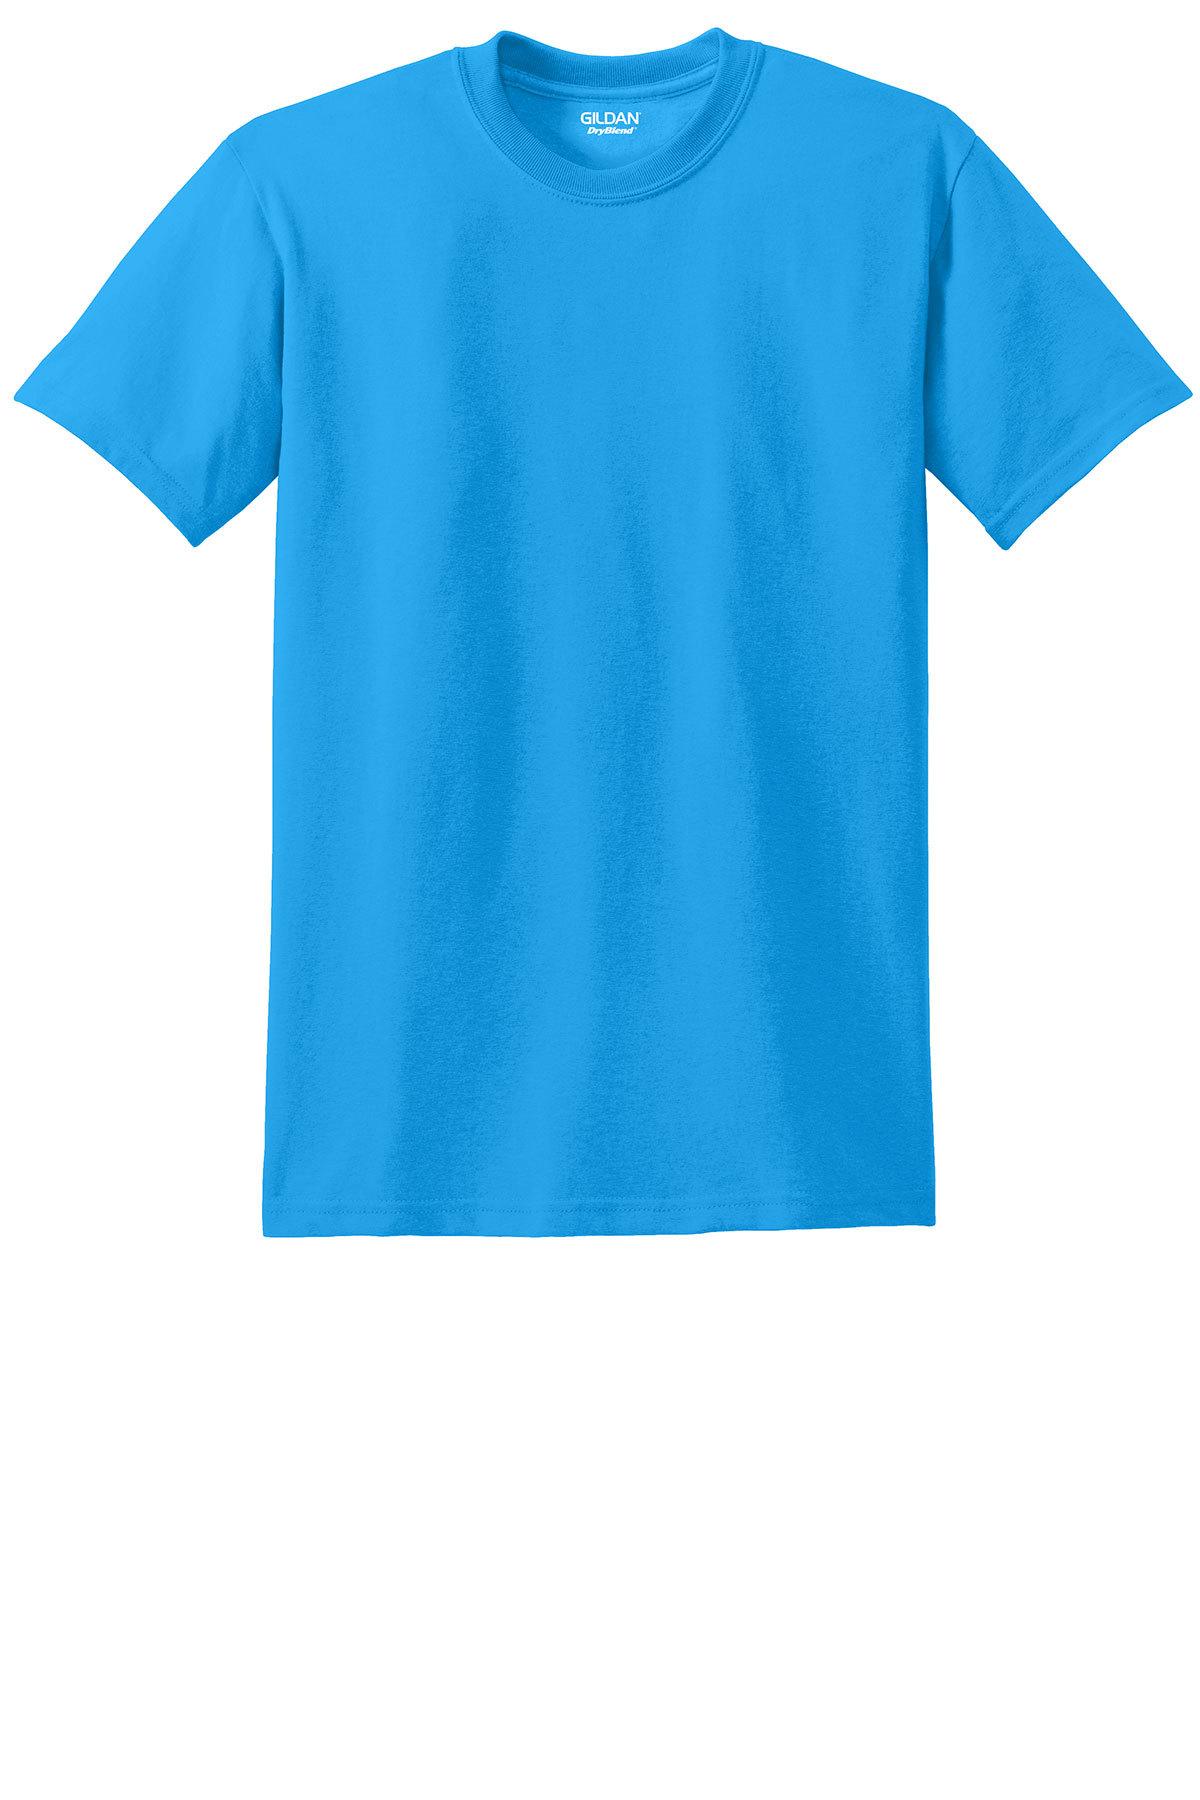 Gildan 174 Dryblend 174 50 Cotton 50 Poly T Shirt 50 50